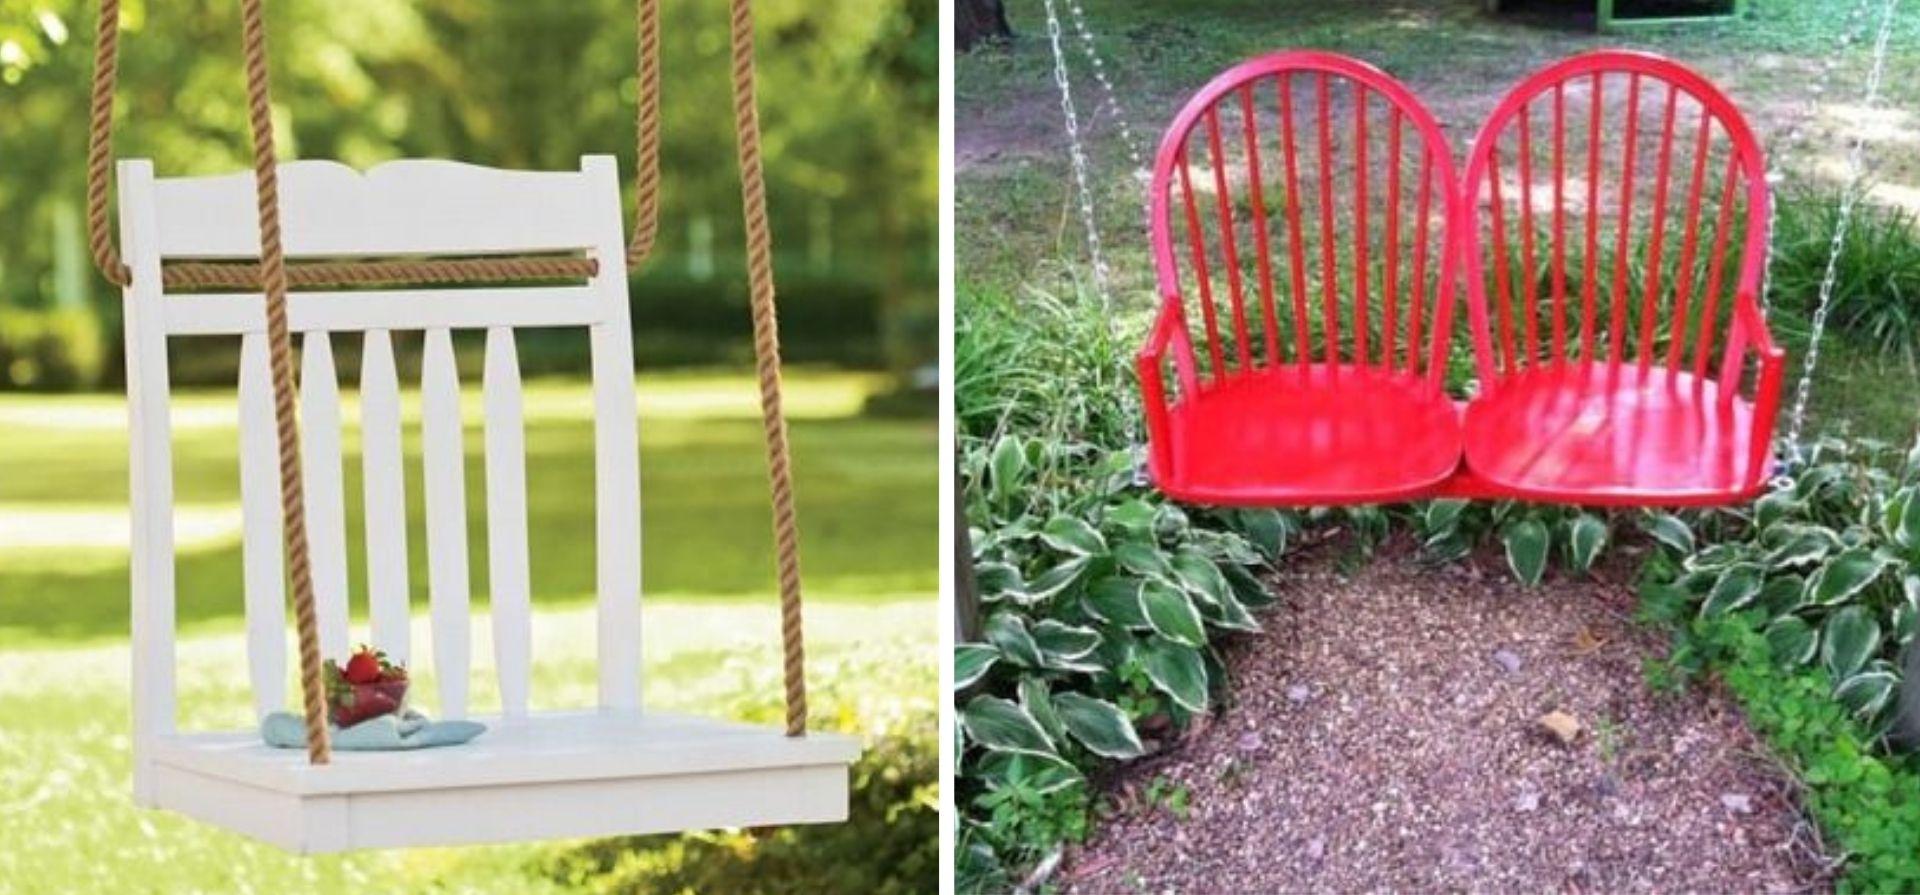 vieille chaise transformation balancoire